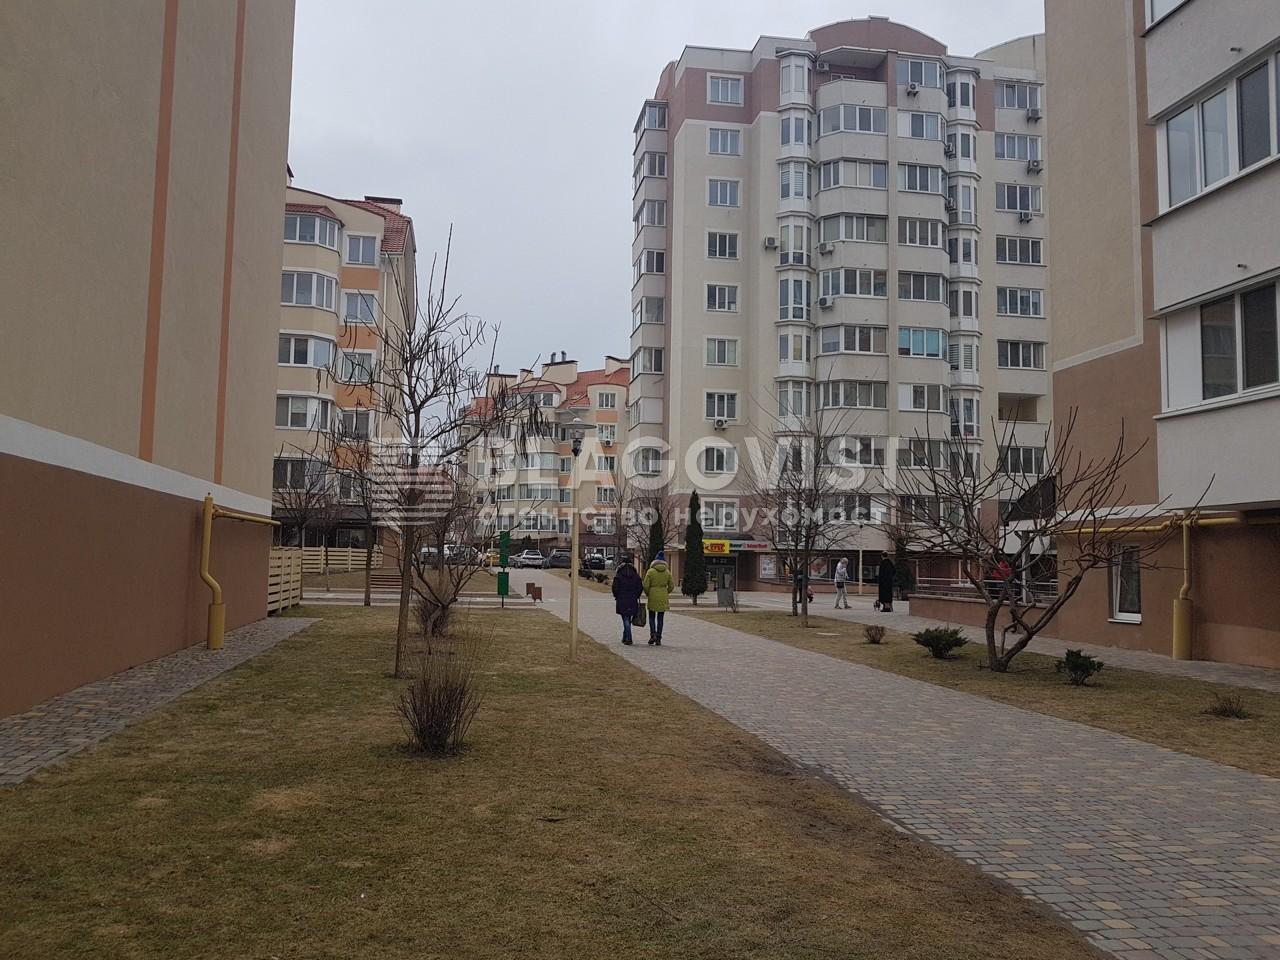 Квартира E-40784, Леси Украинки, 4, Софиевская Борщаговка - Фото 45